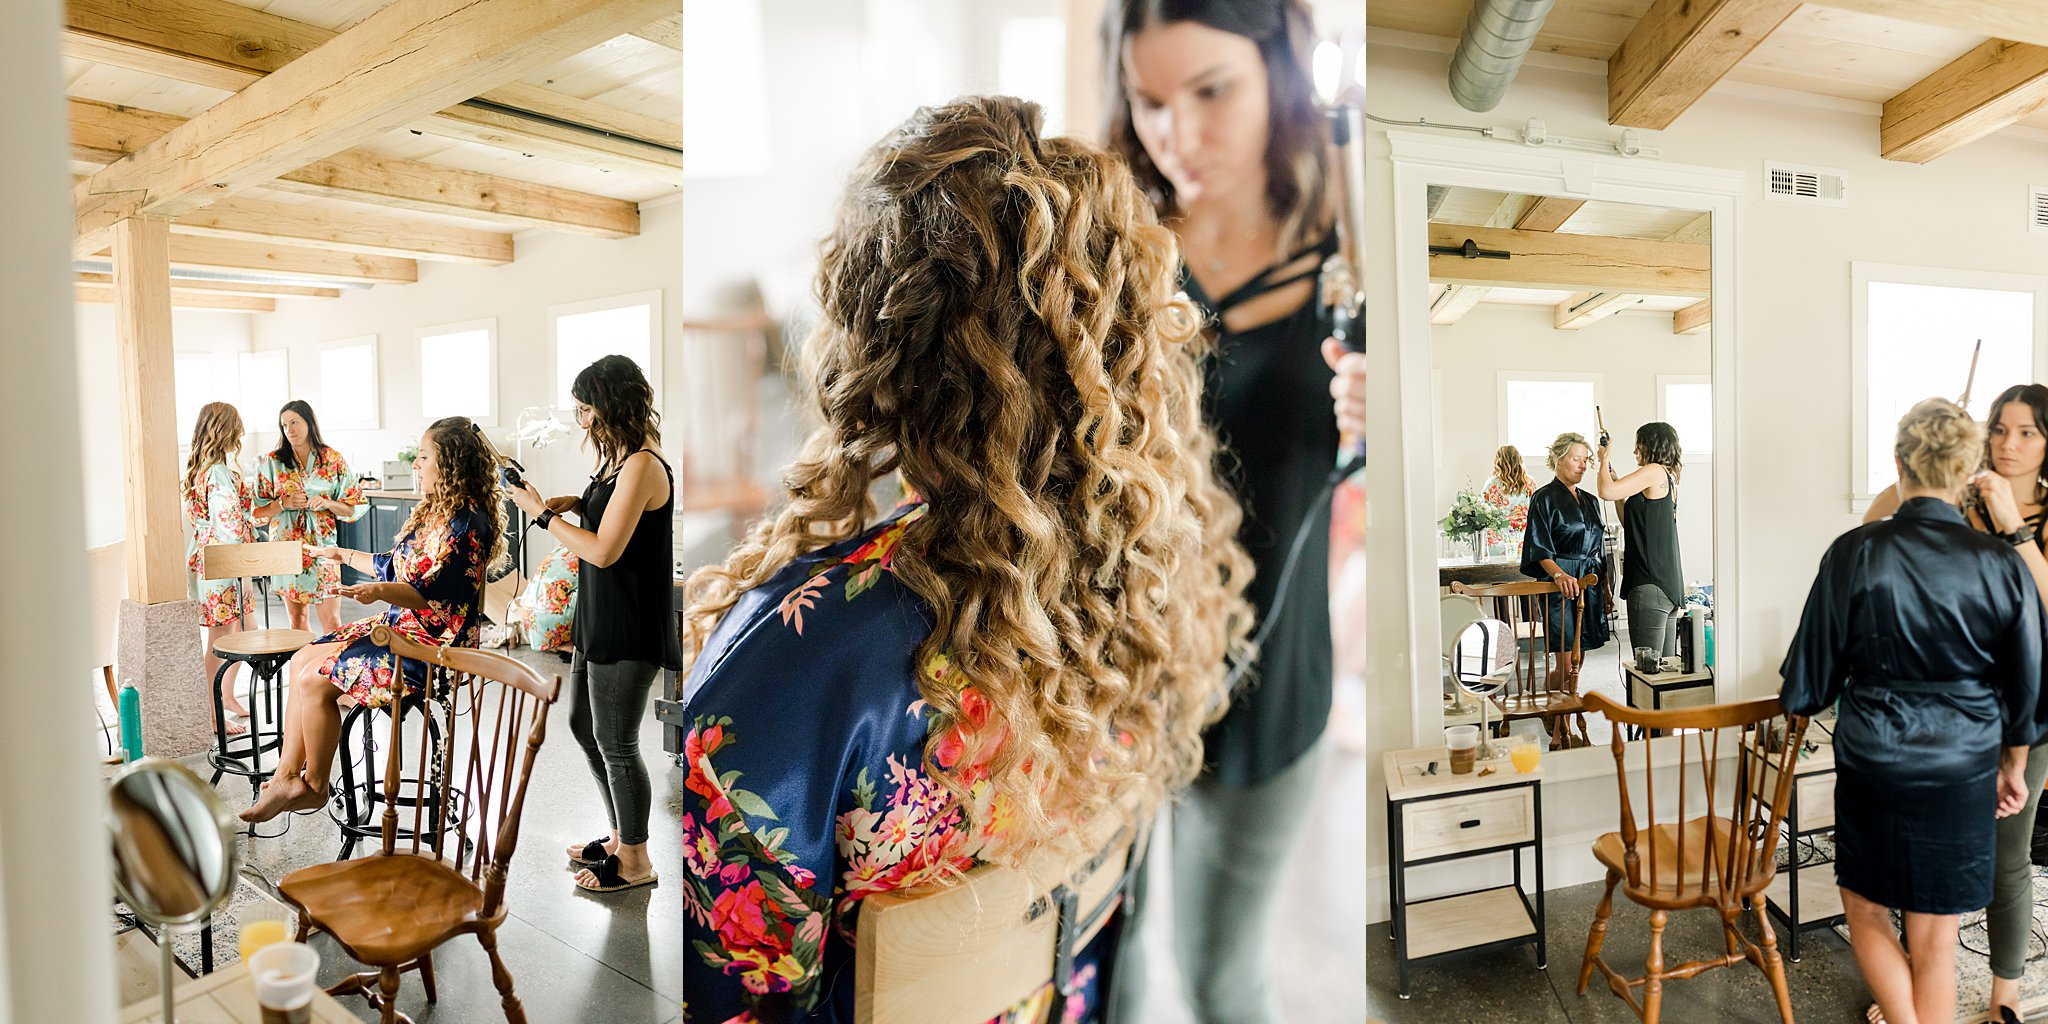 1. Hair & Makeup Running Late -